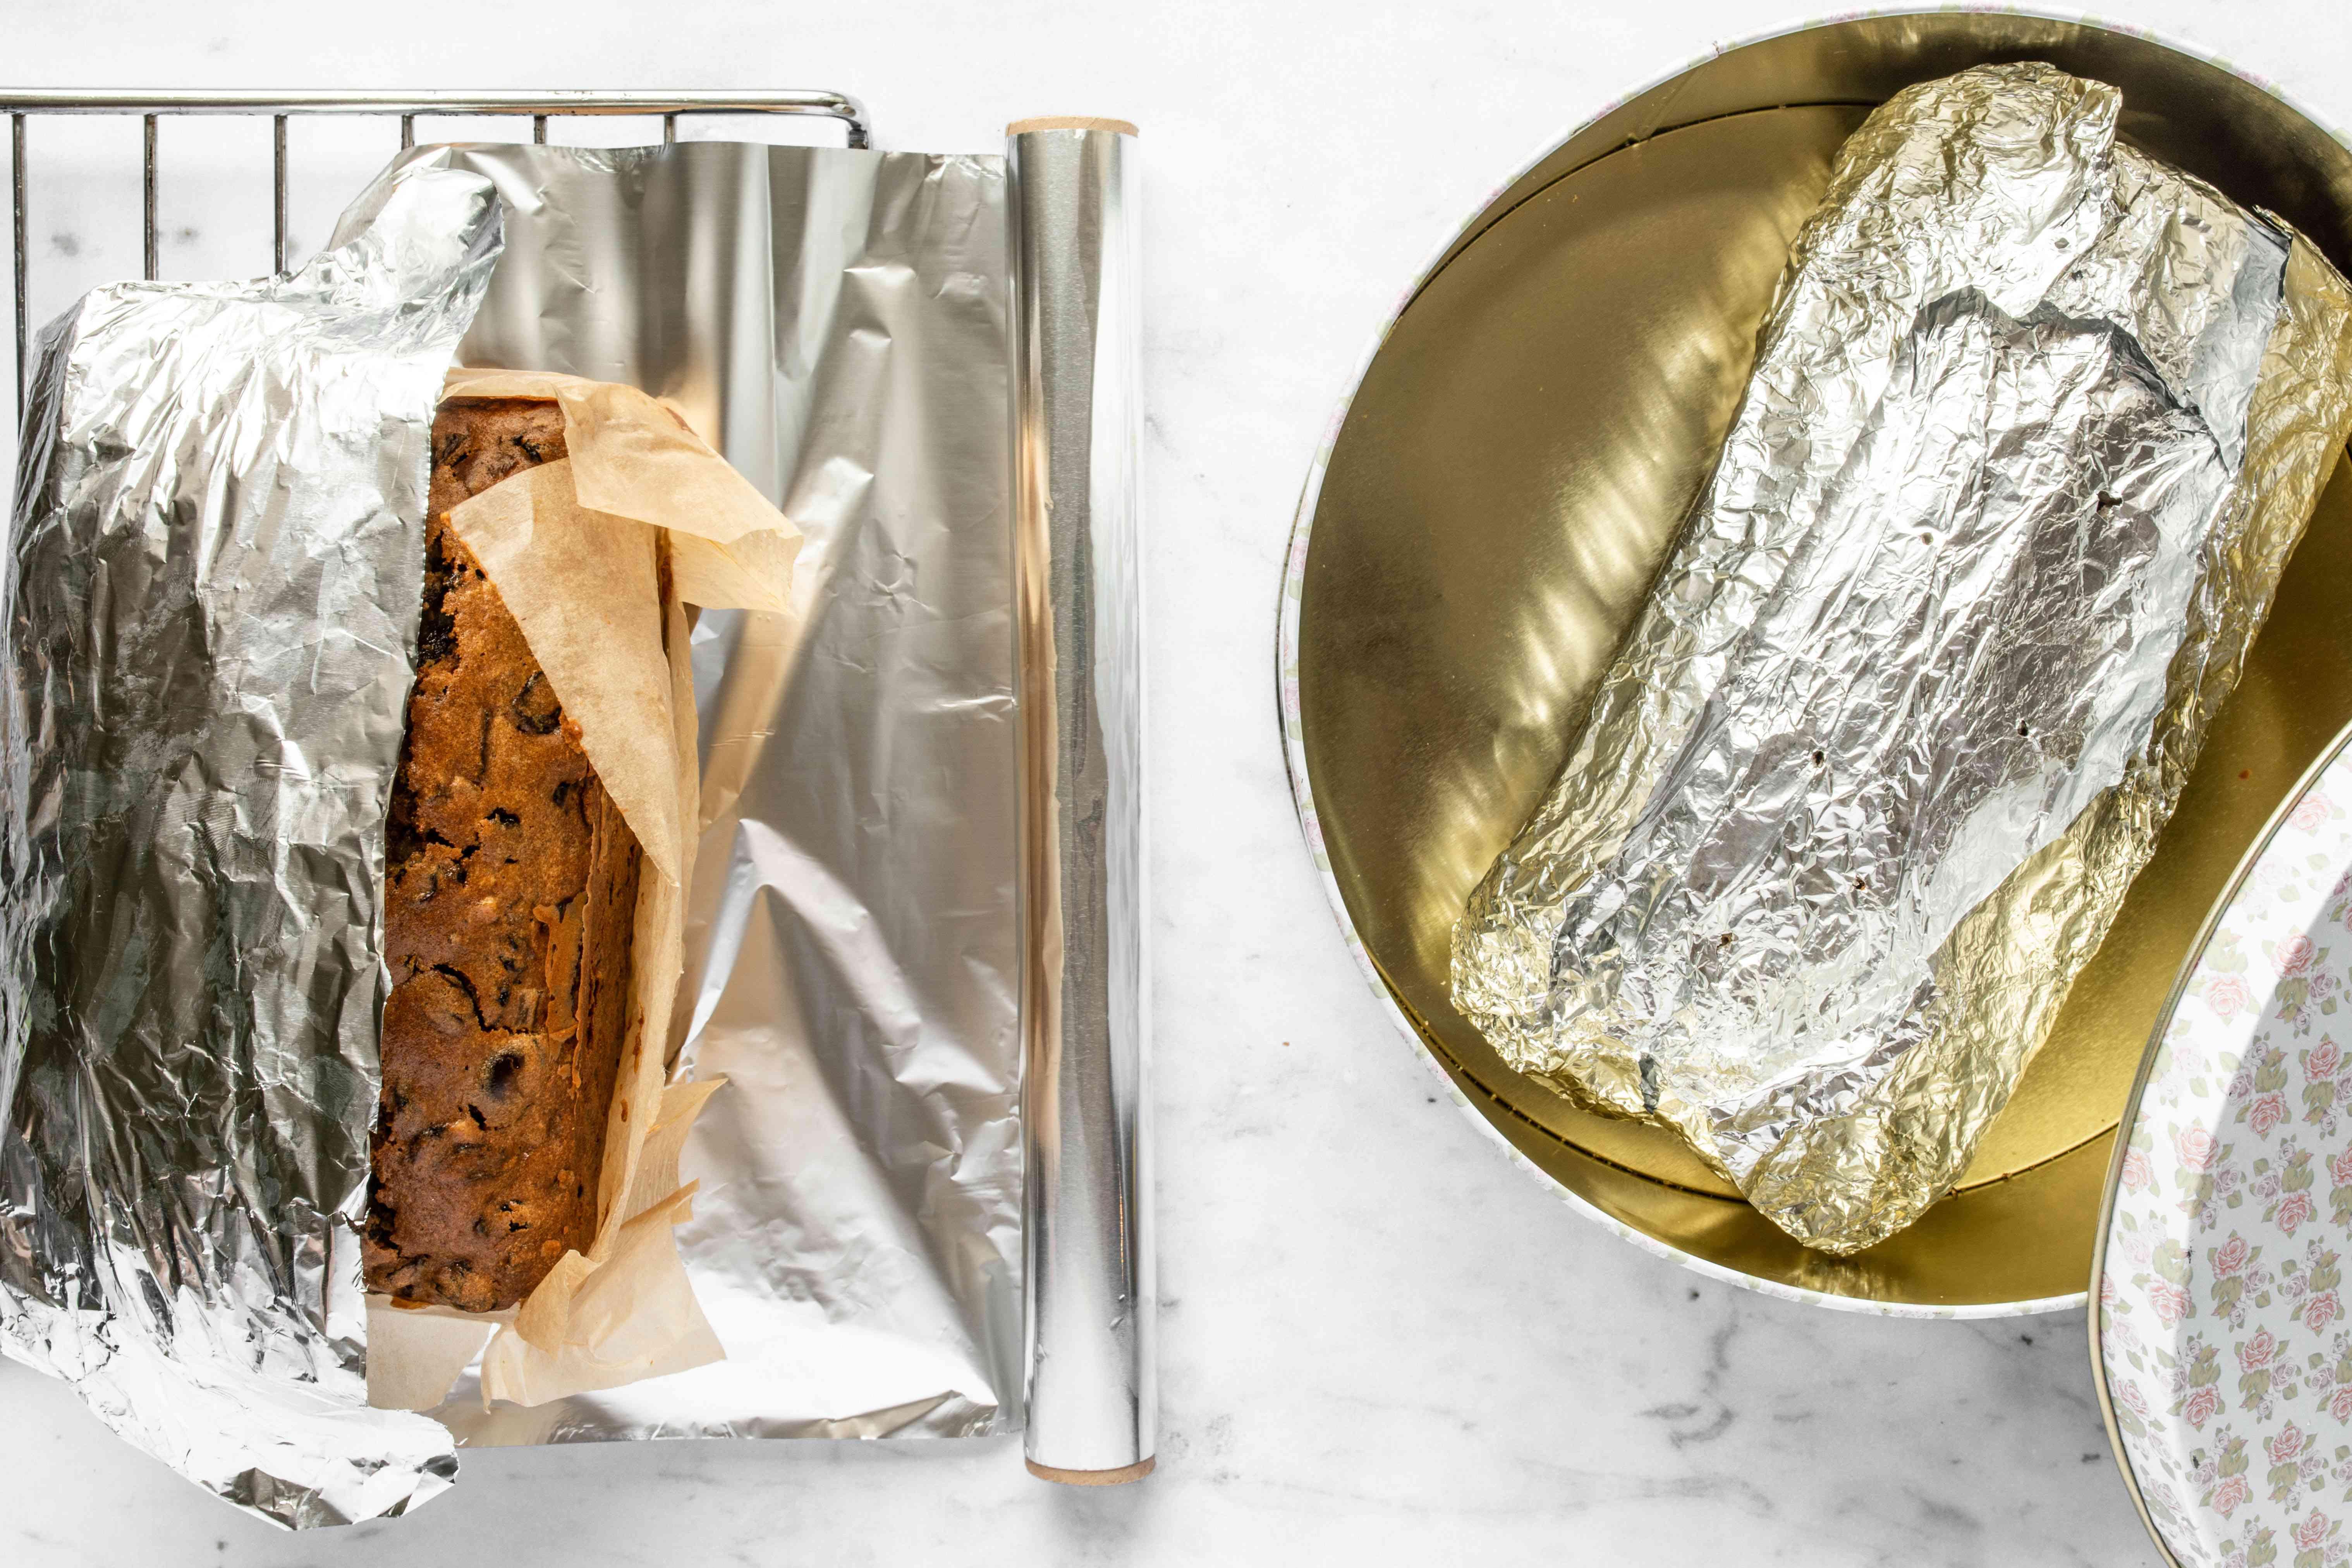 Wrap the cakes